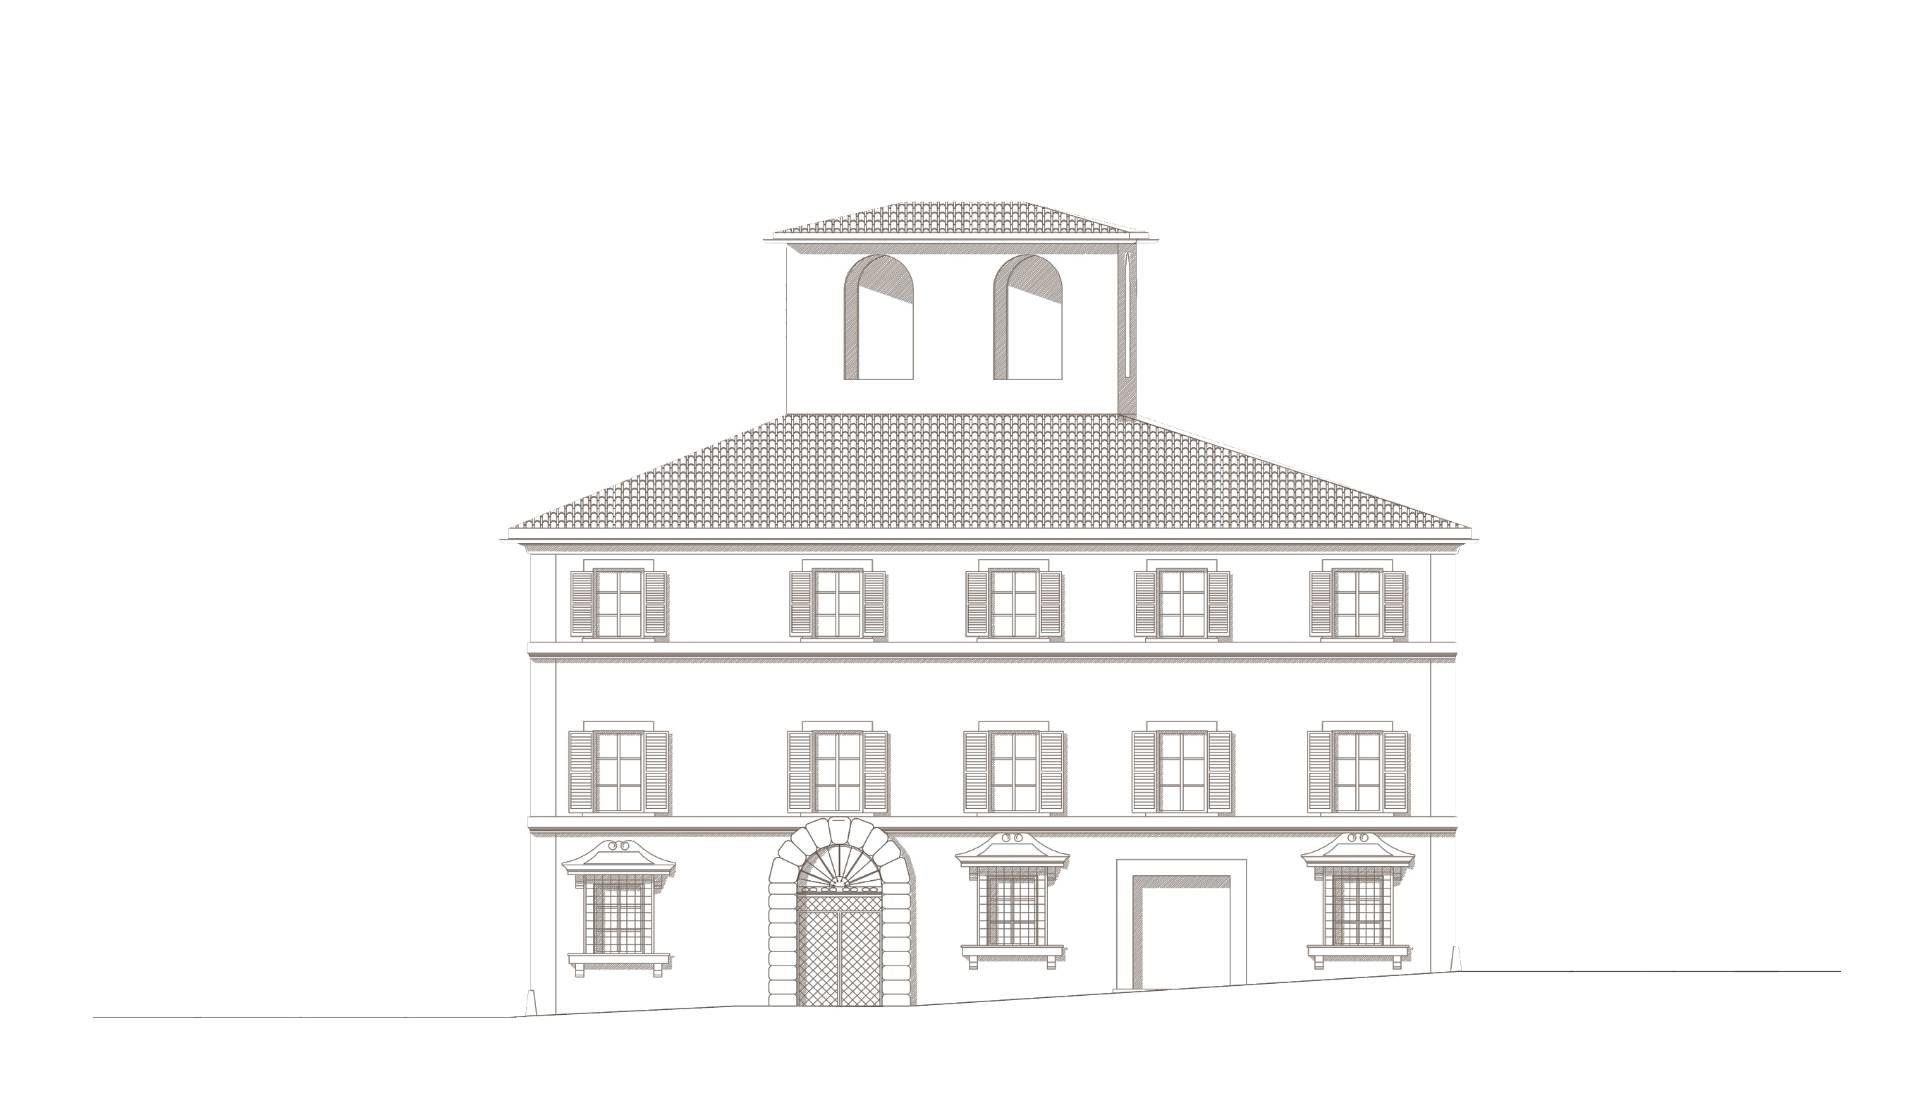 Appartamento VITERBO vendita  Centro  Coldwell Banker FRG & Partners